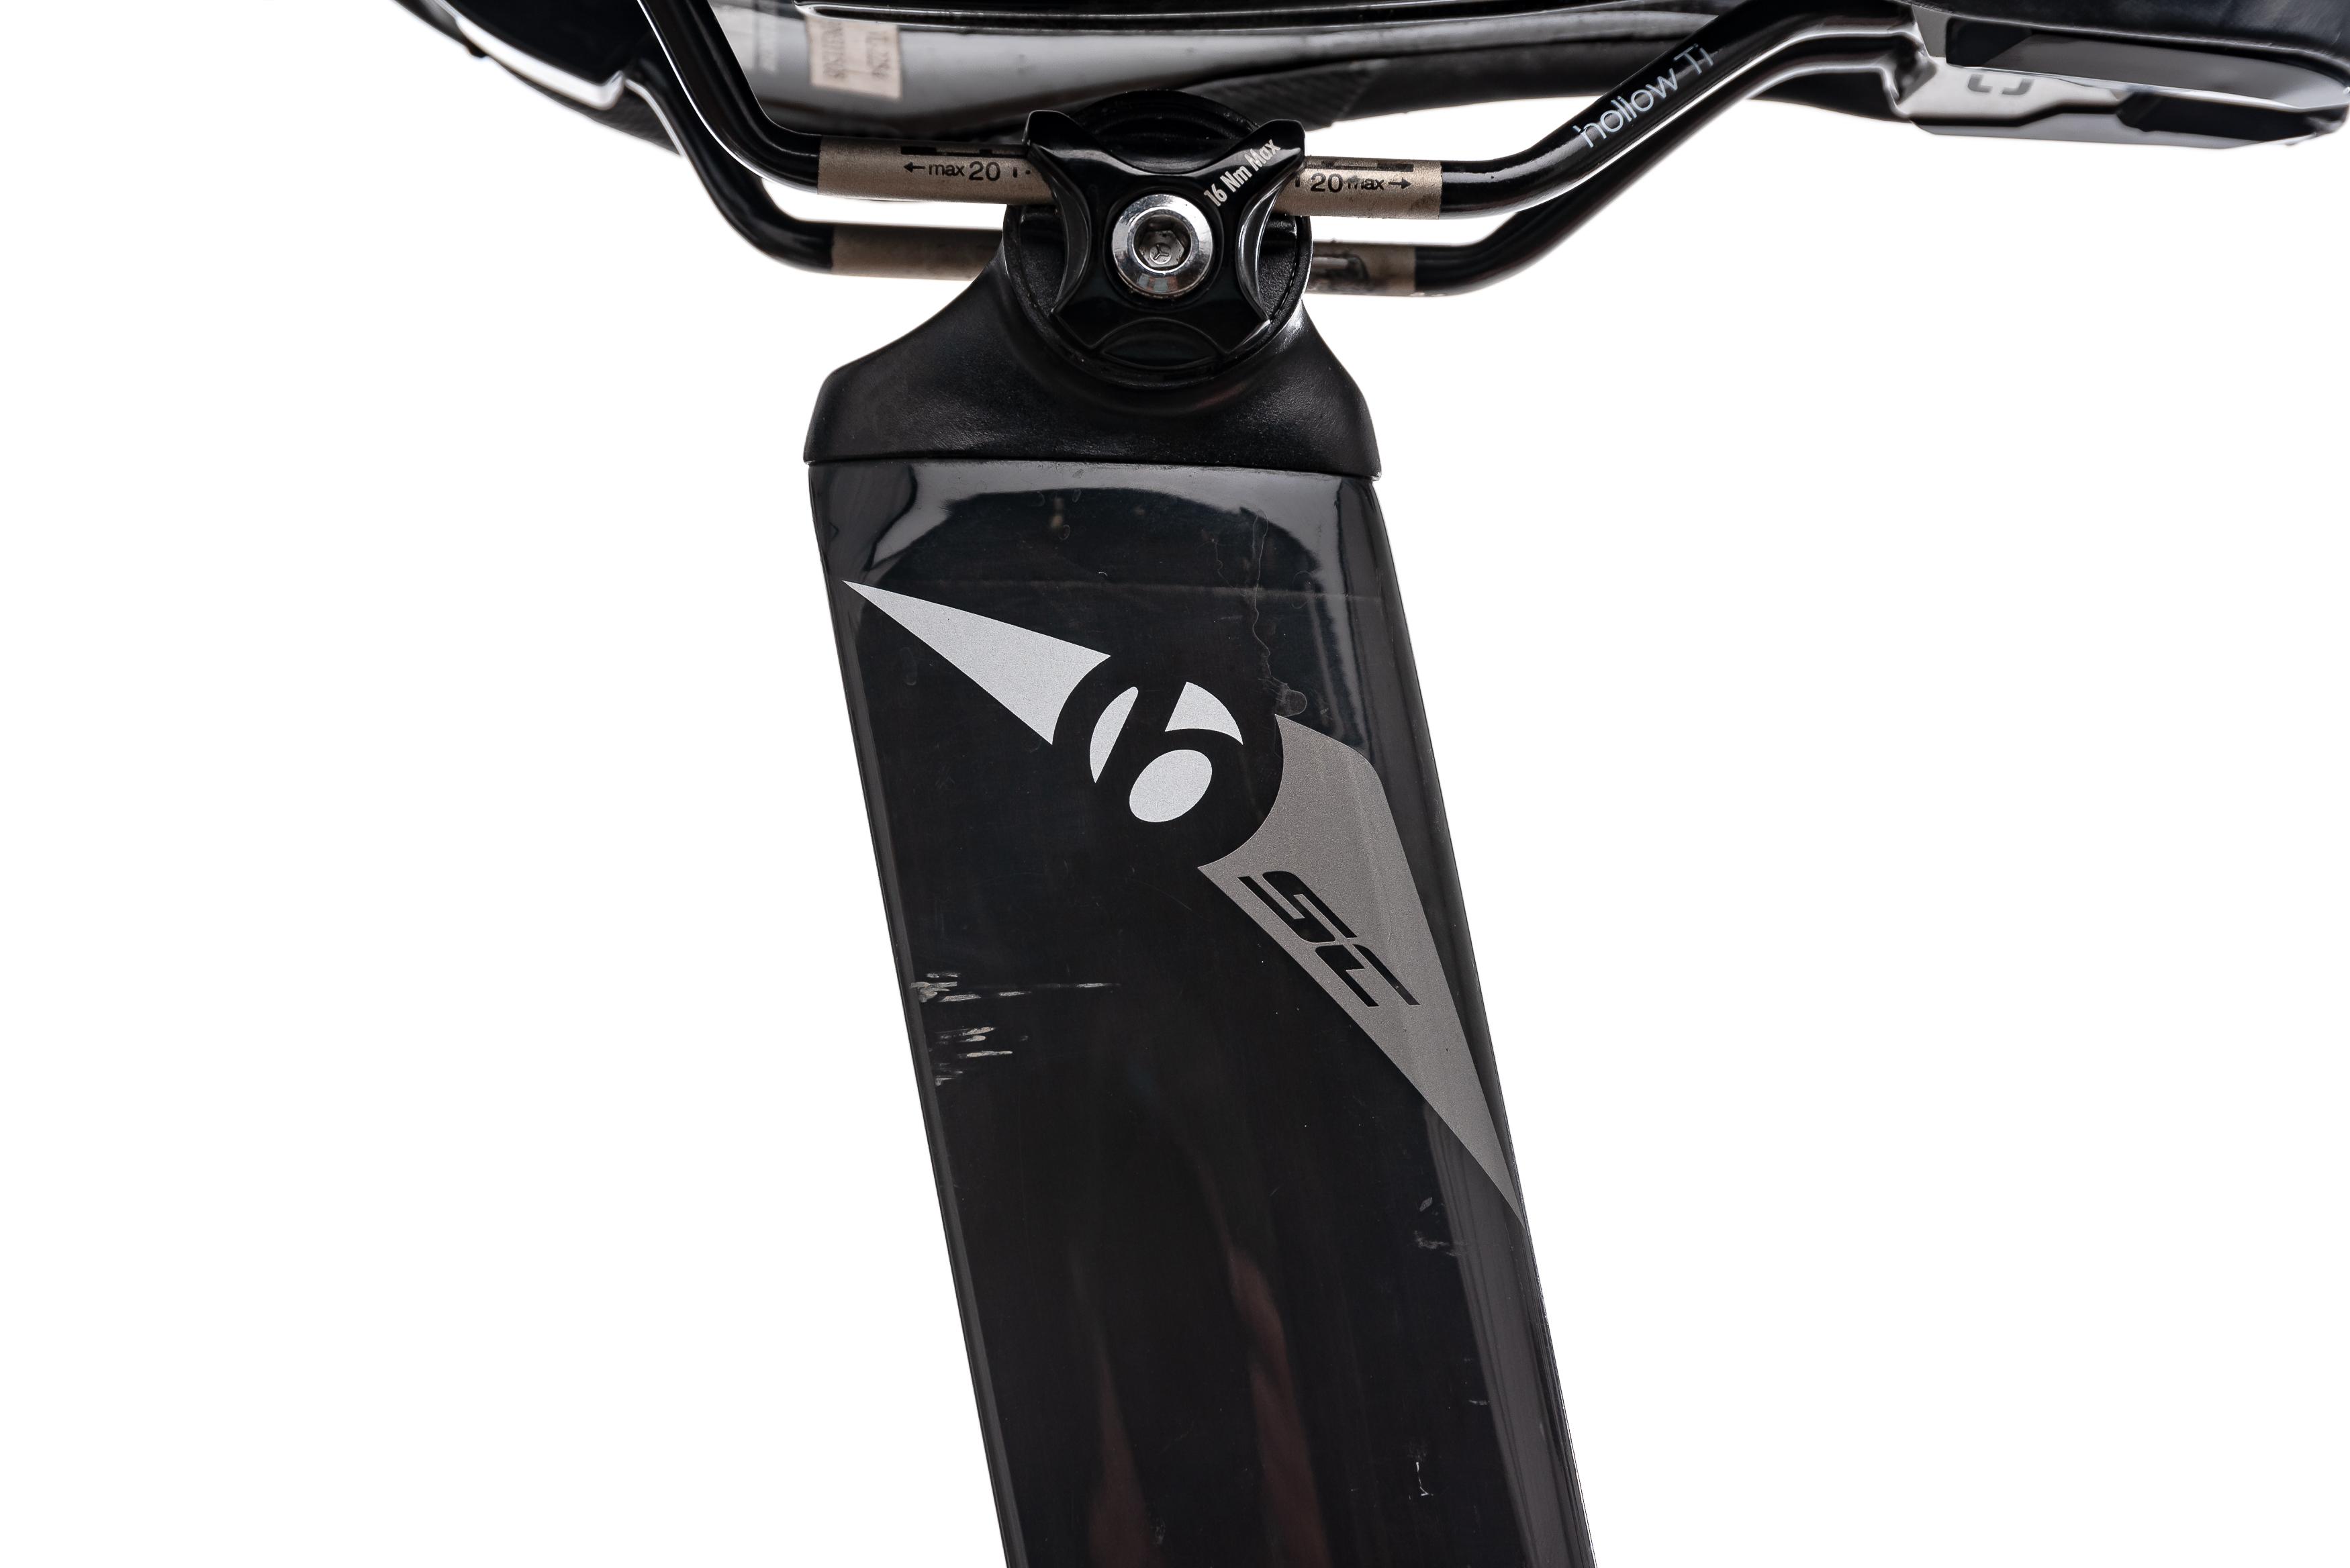 2013-Trek-Speed-Concept-7-Series-Time-Trial-Bike-XL-Carbon-SRAM-Force-Rolf miniature 8